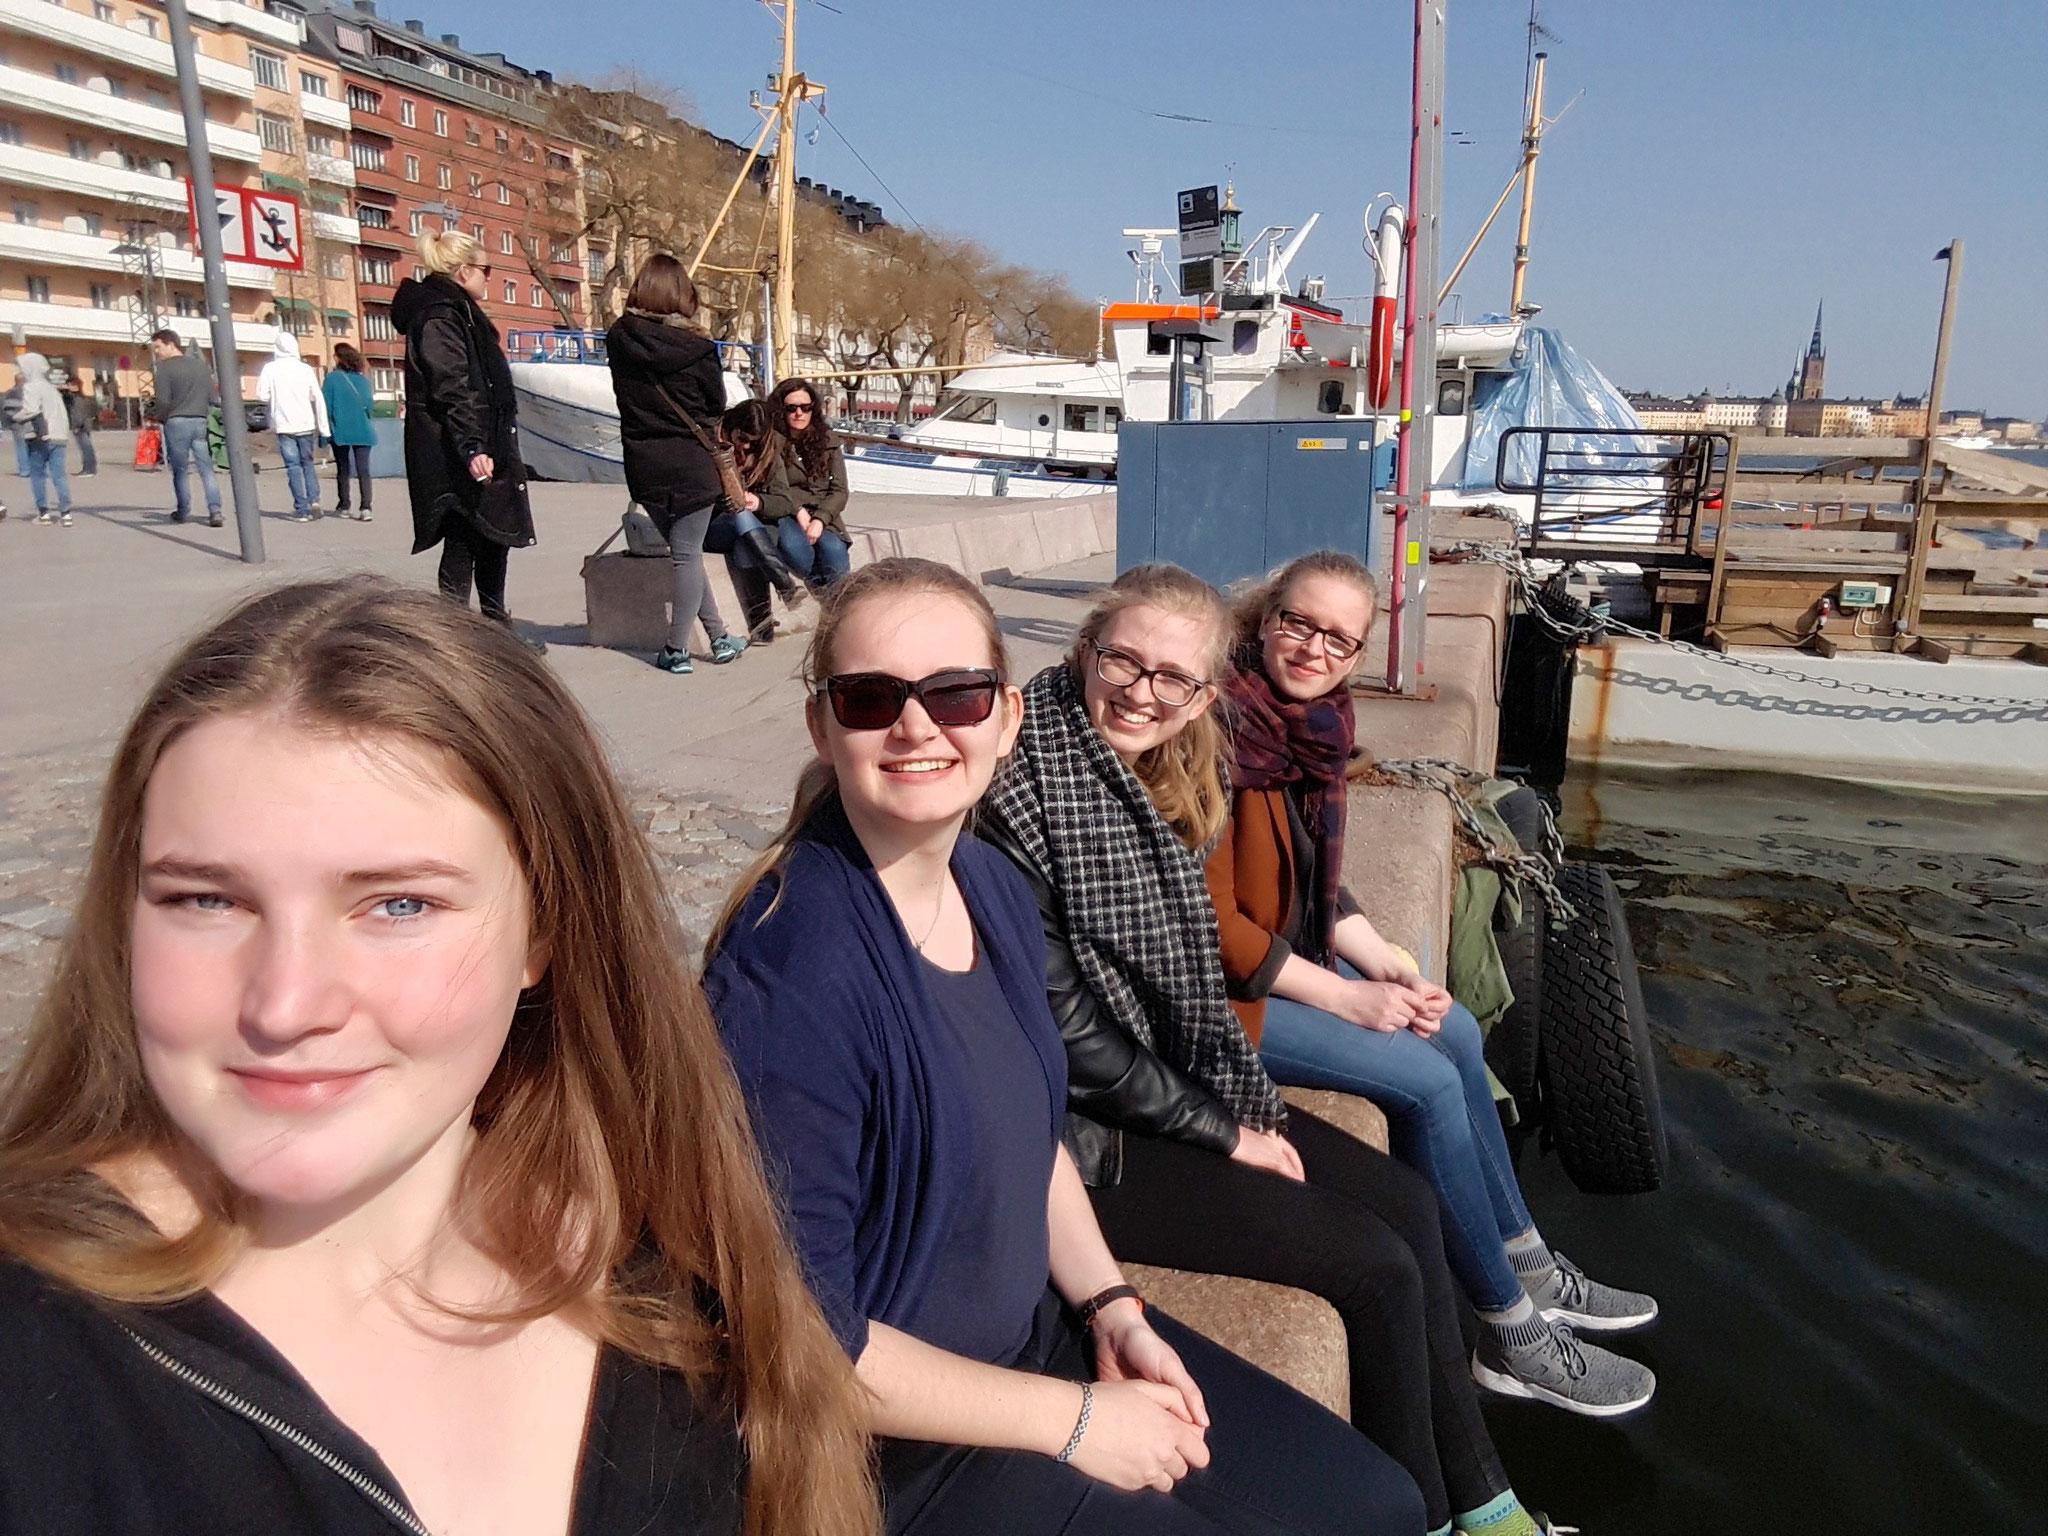 Corona Widmayer, Maria Korten, Magdalena Kollbeck und Stephanie Jarvers in Stockholm